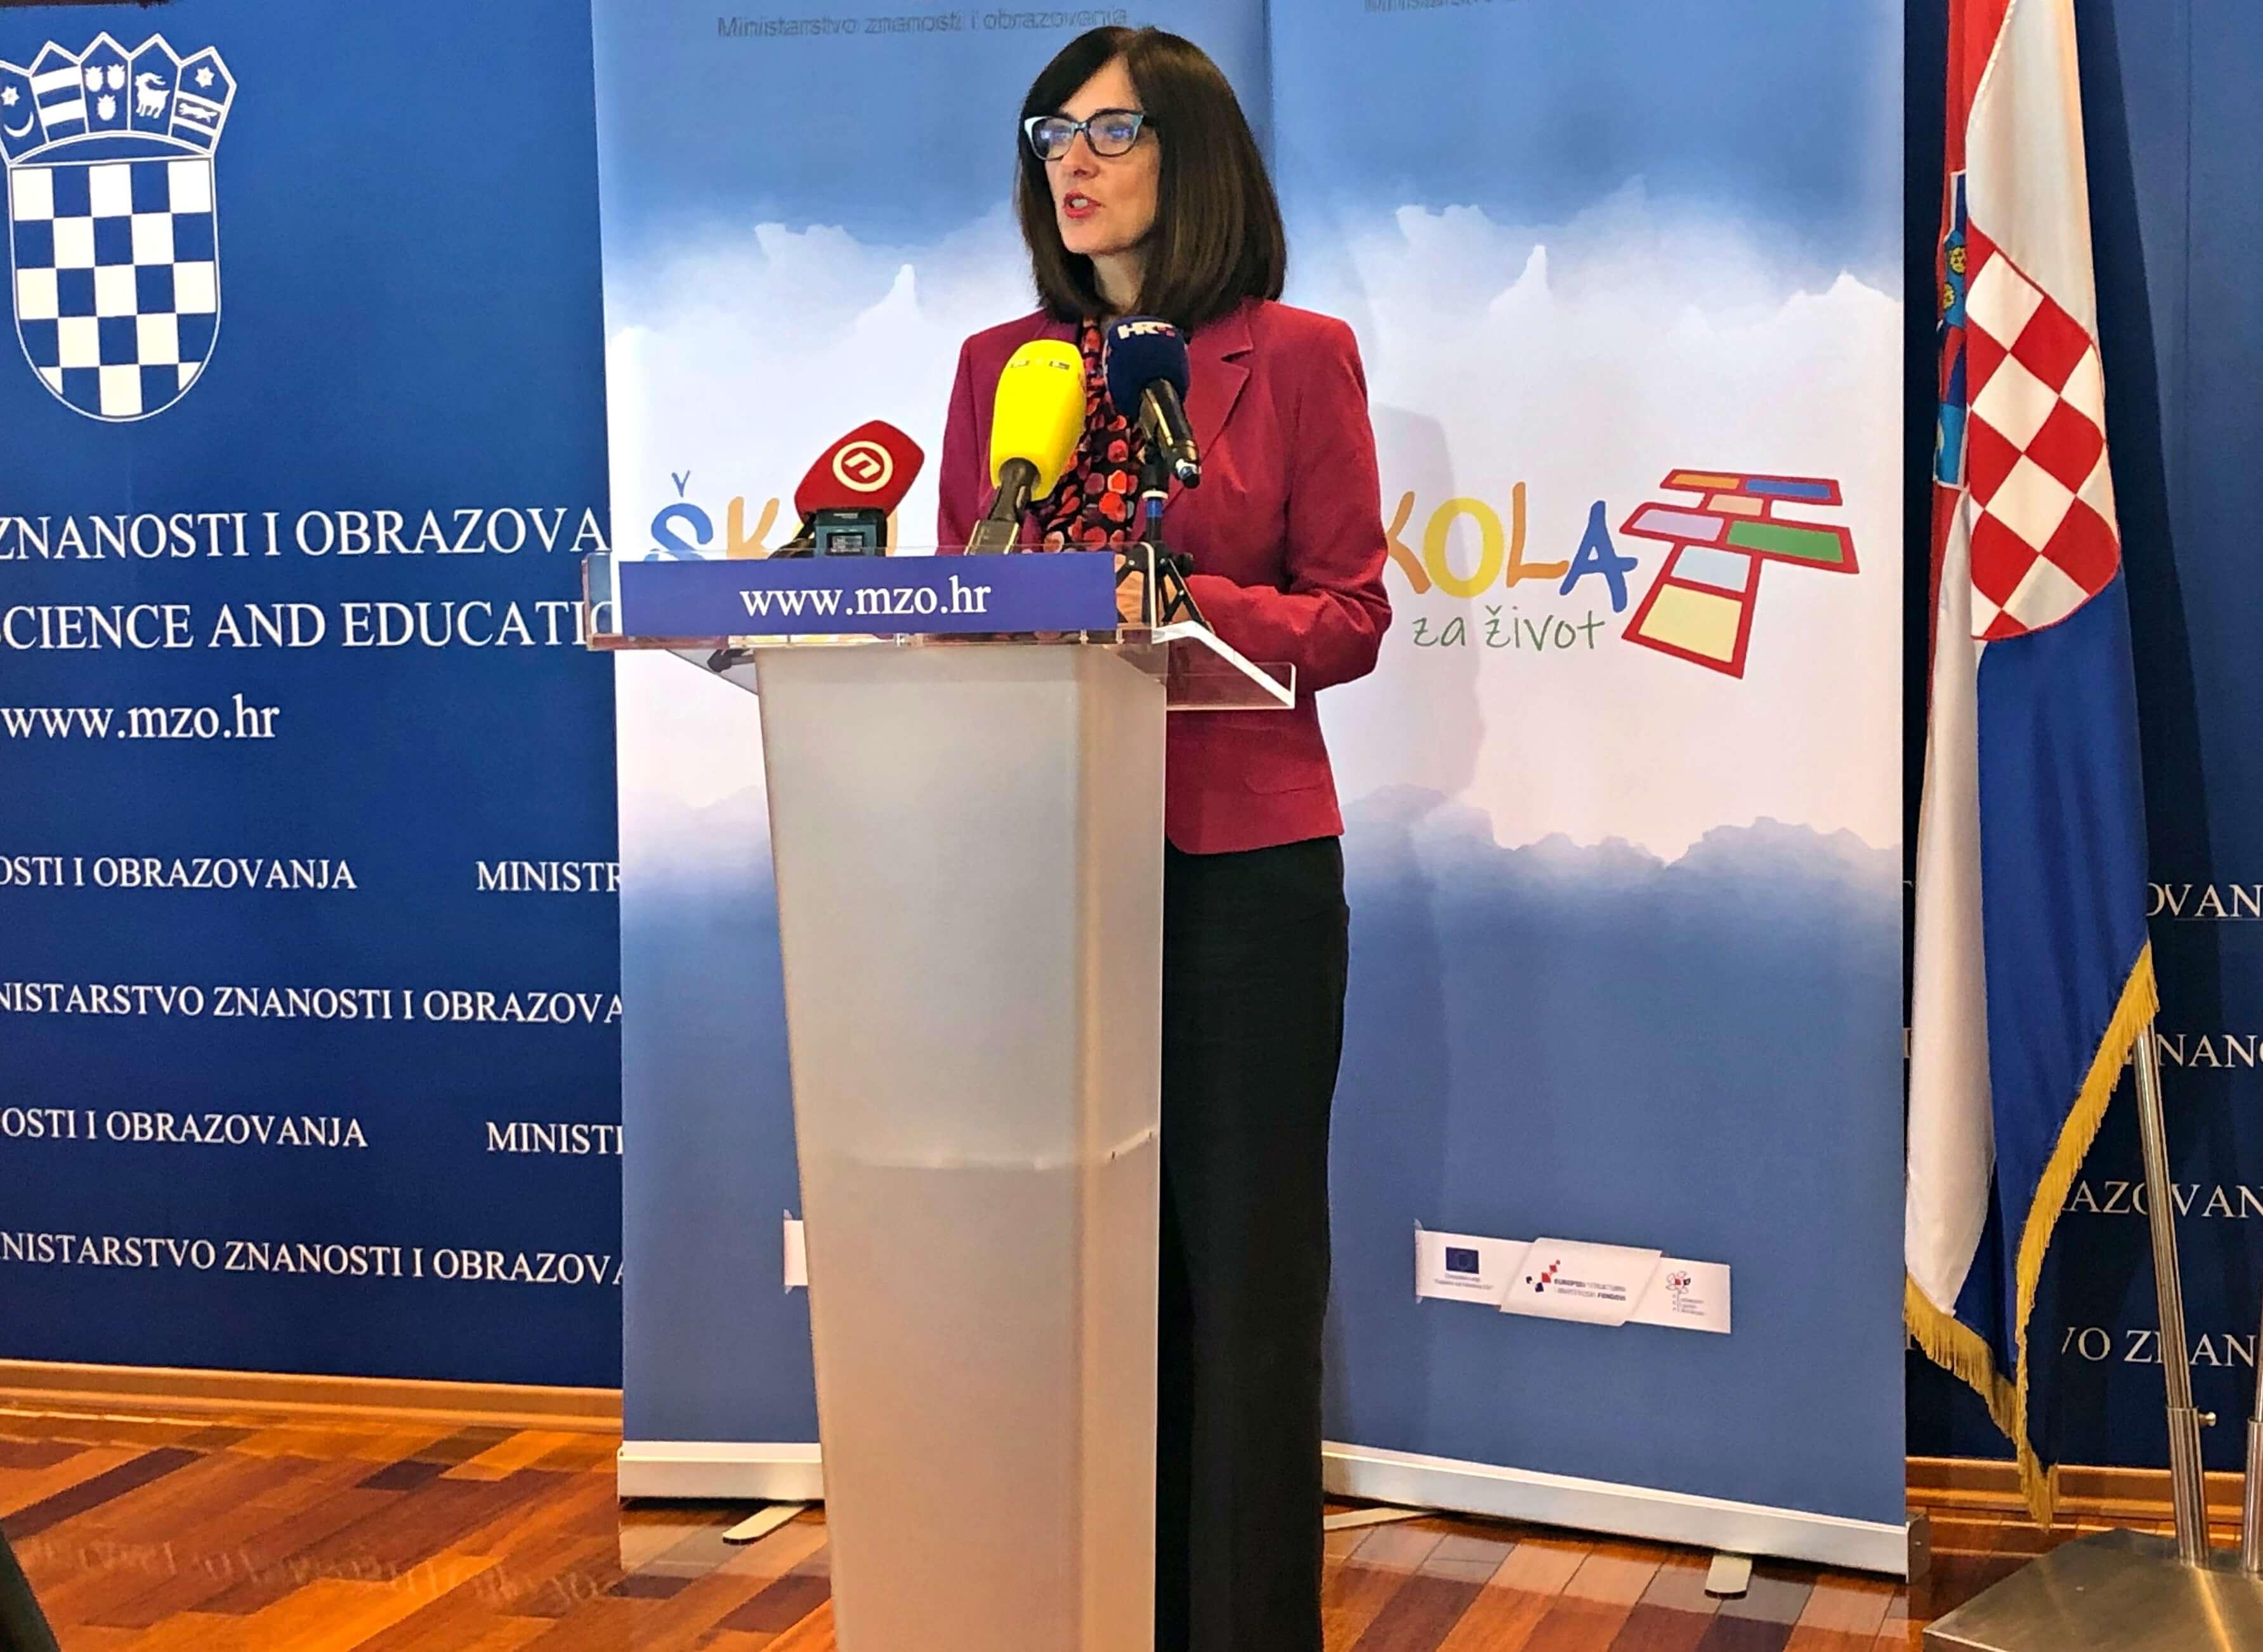 Ministrica obrazovanja Divjak odgovorila biskupu Košiću: Svatko nek se drži svojih nadležnosti